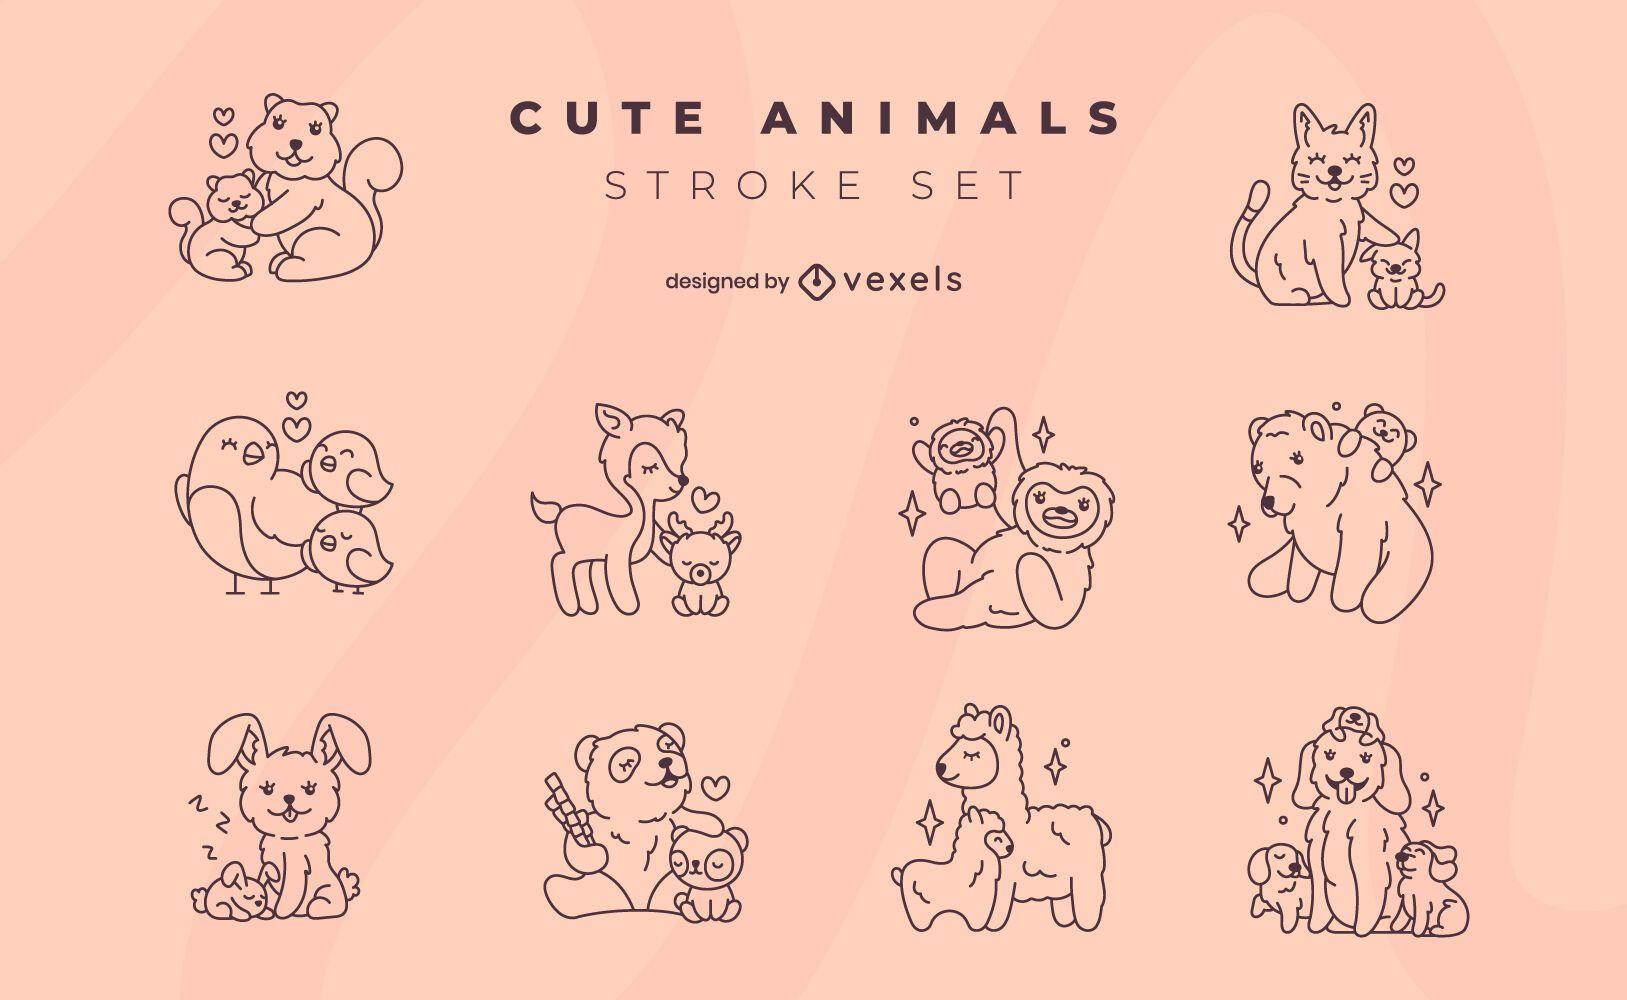 Cute animal family stroke set